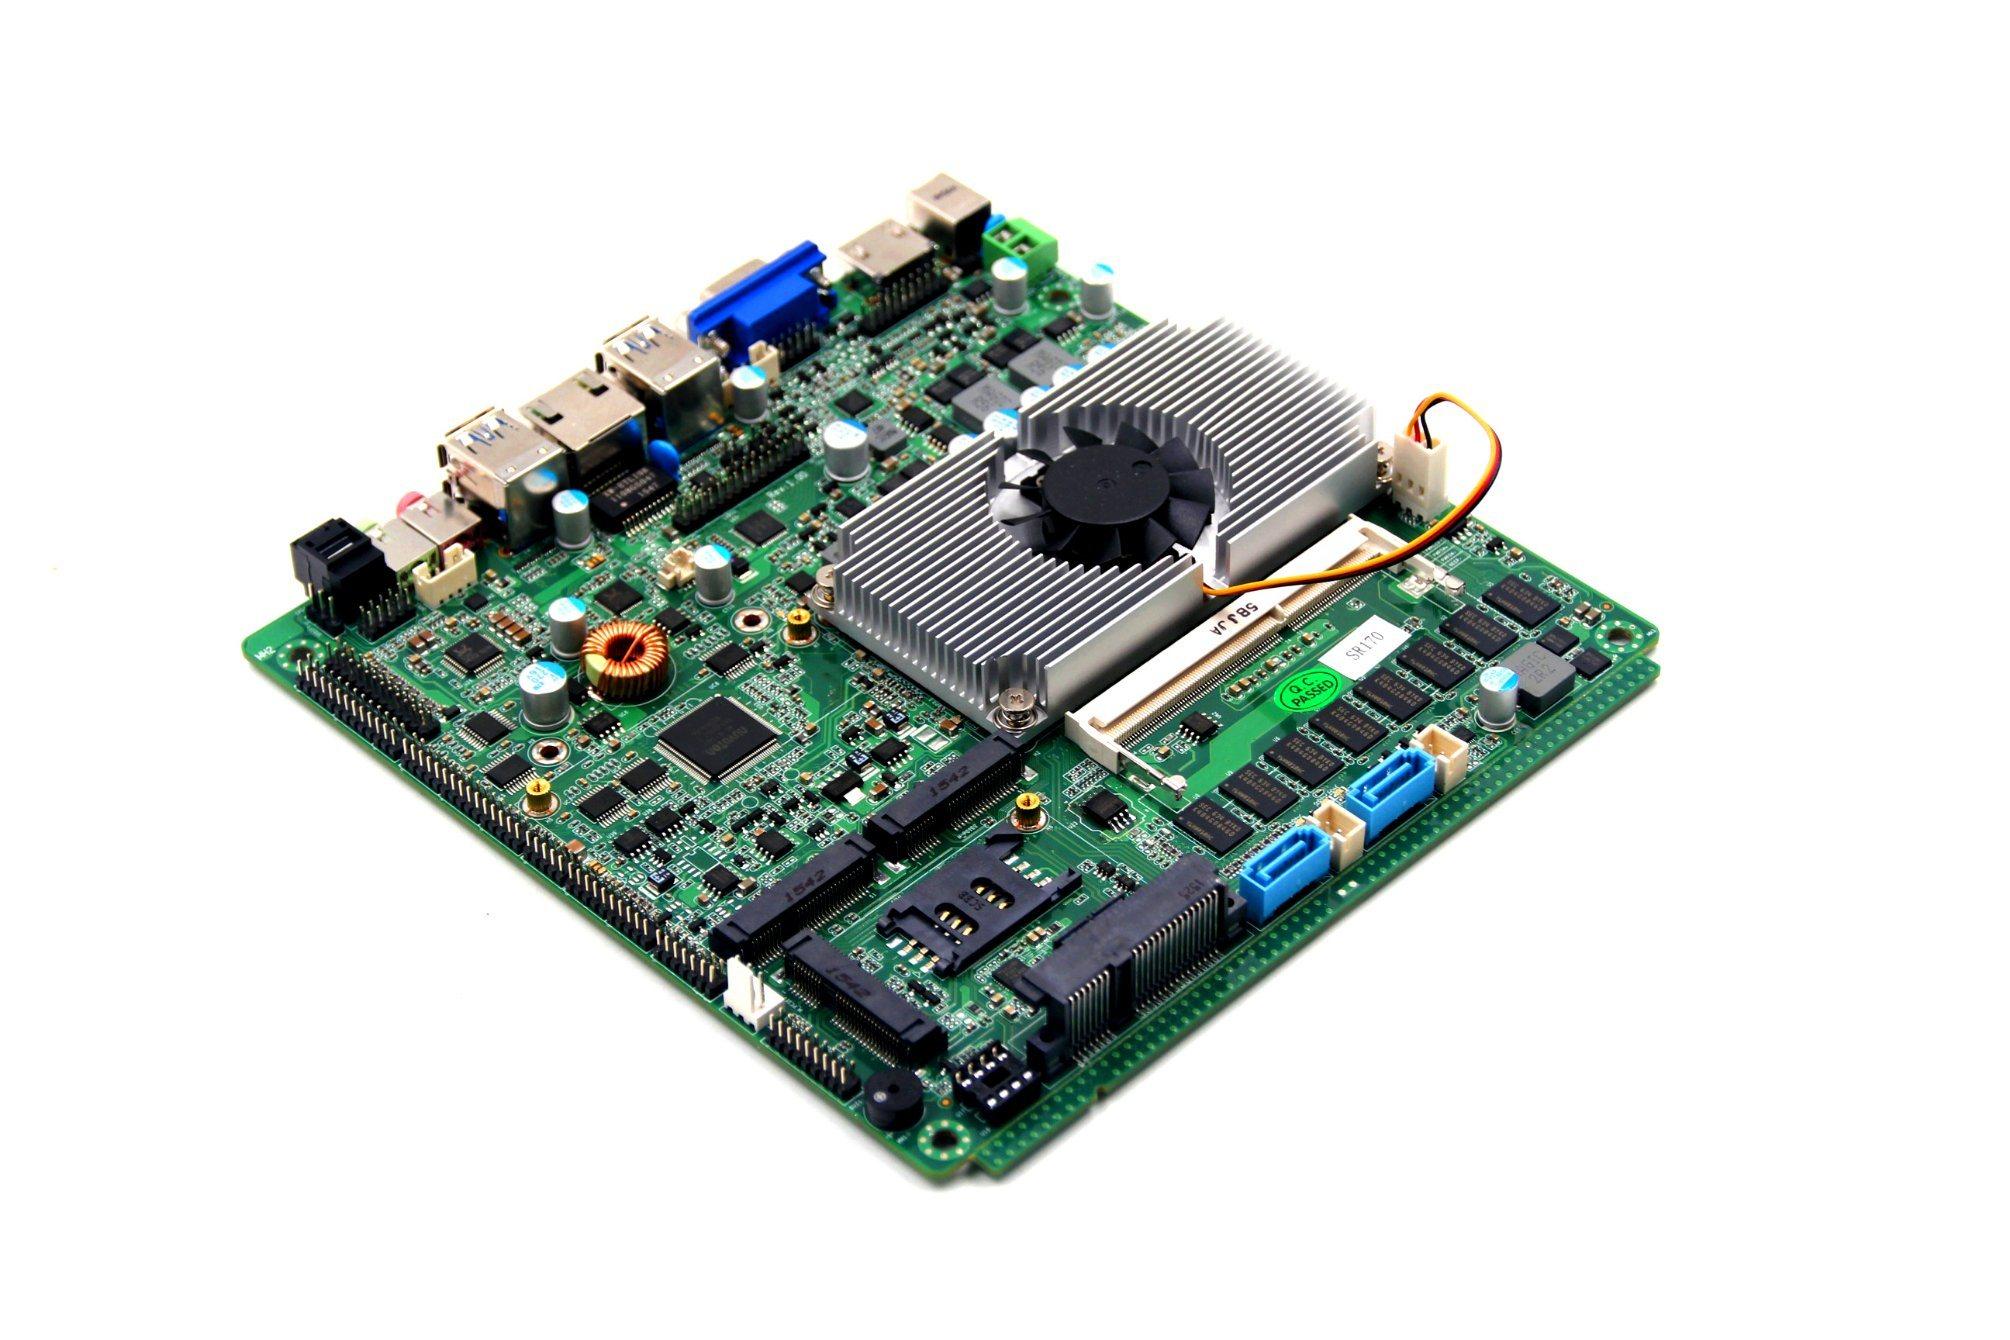 China Haswell Top80b Bga1168 Intel Core I3 I5 I7 Cpu Mini Motherboard H61 Suport Lga 1155 Itx For Aio Pc Oem